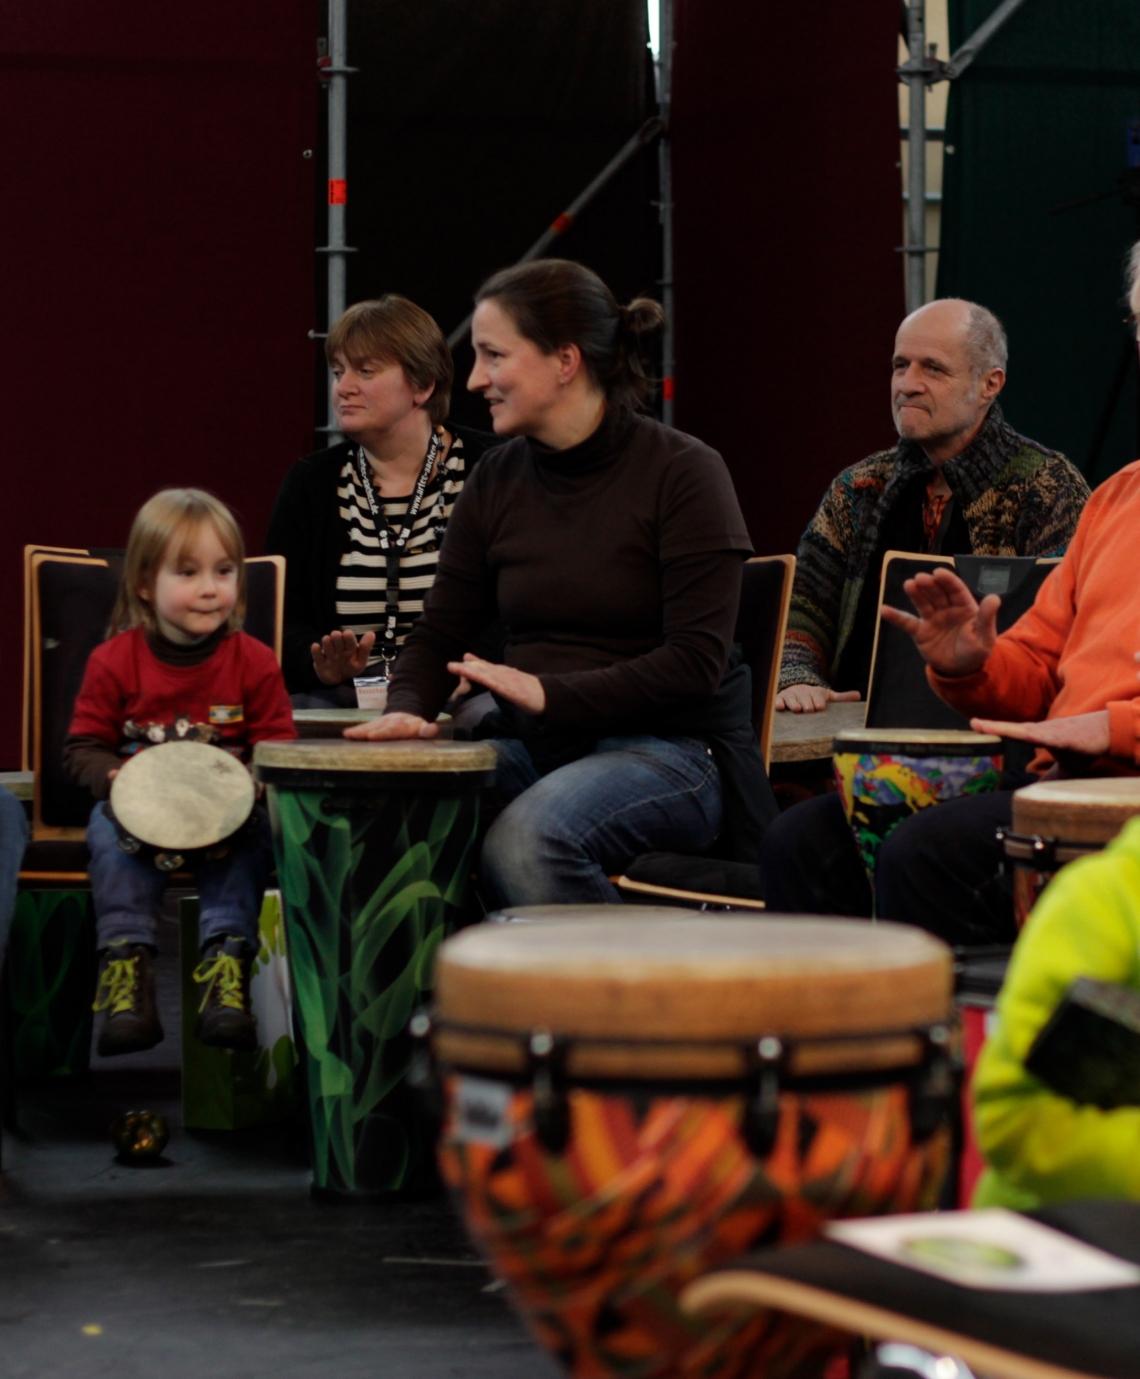 Drum Circle - generationsübergreifend